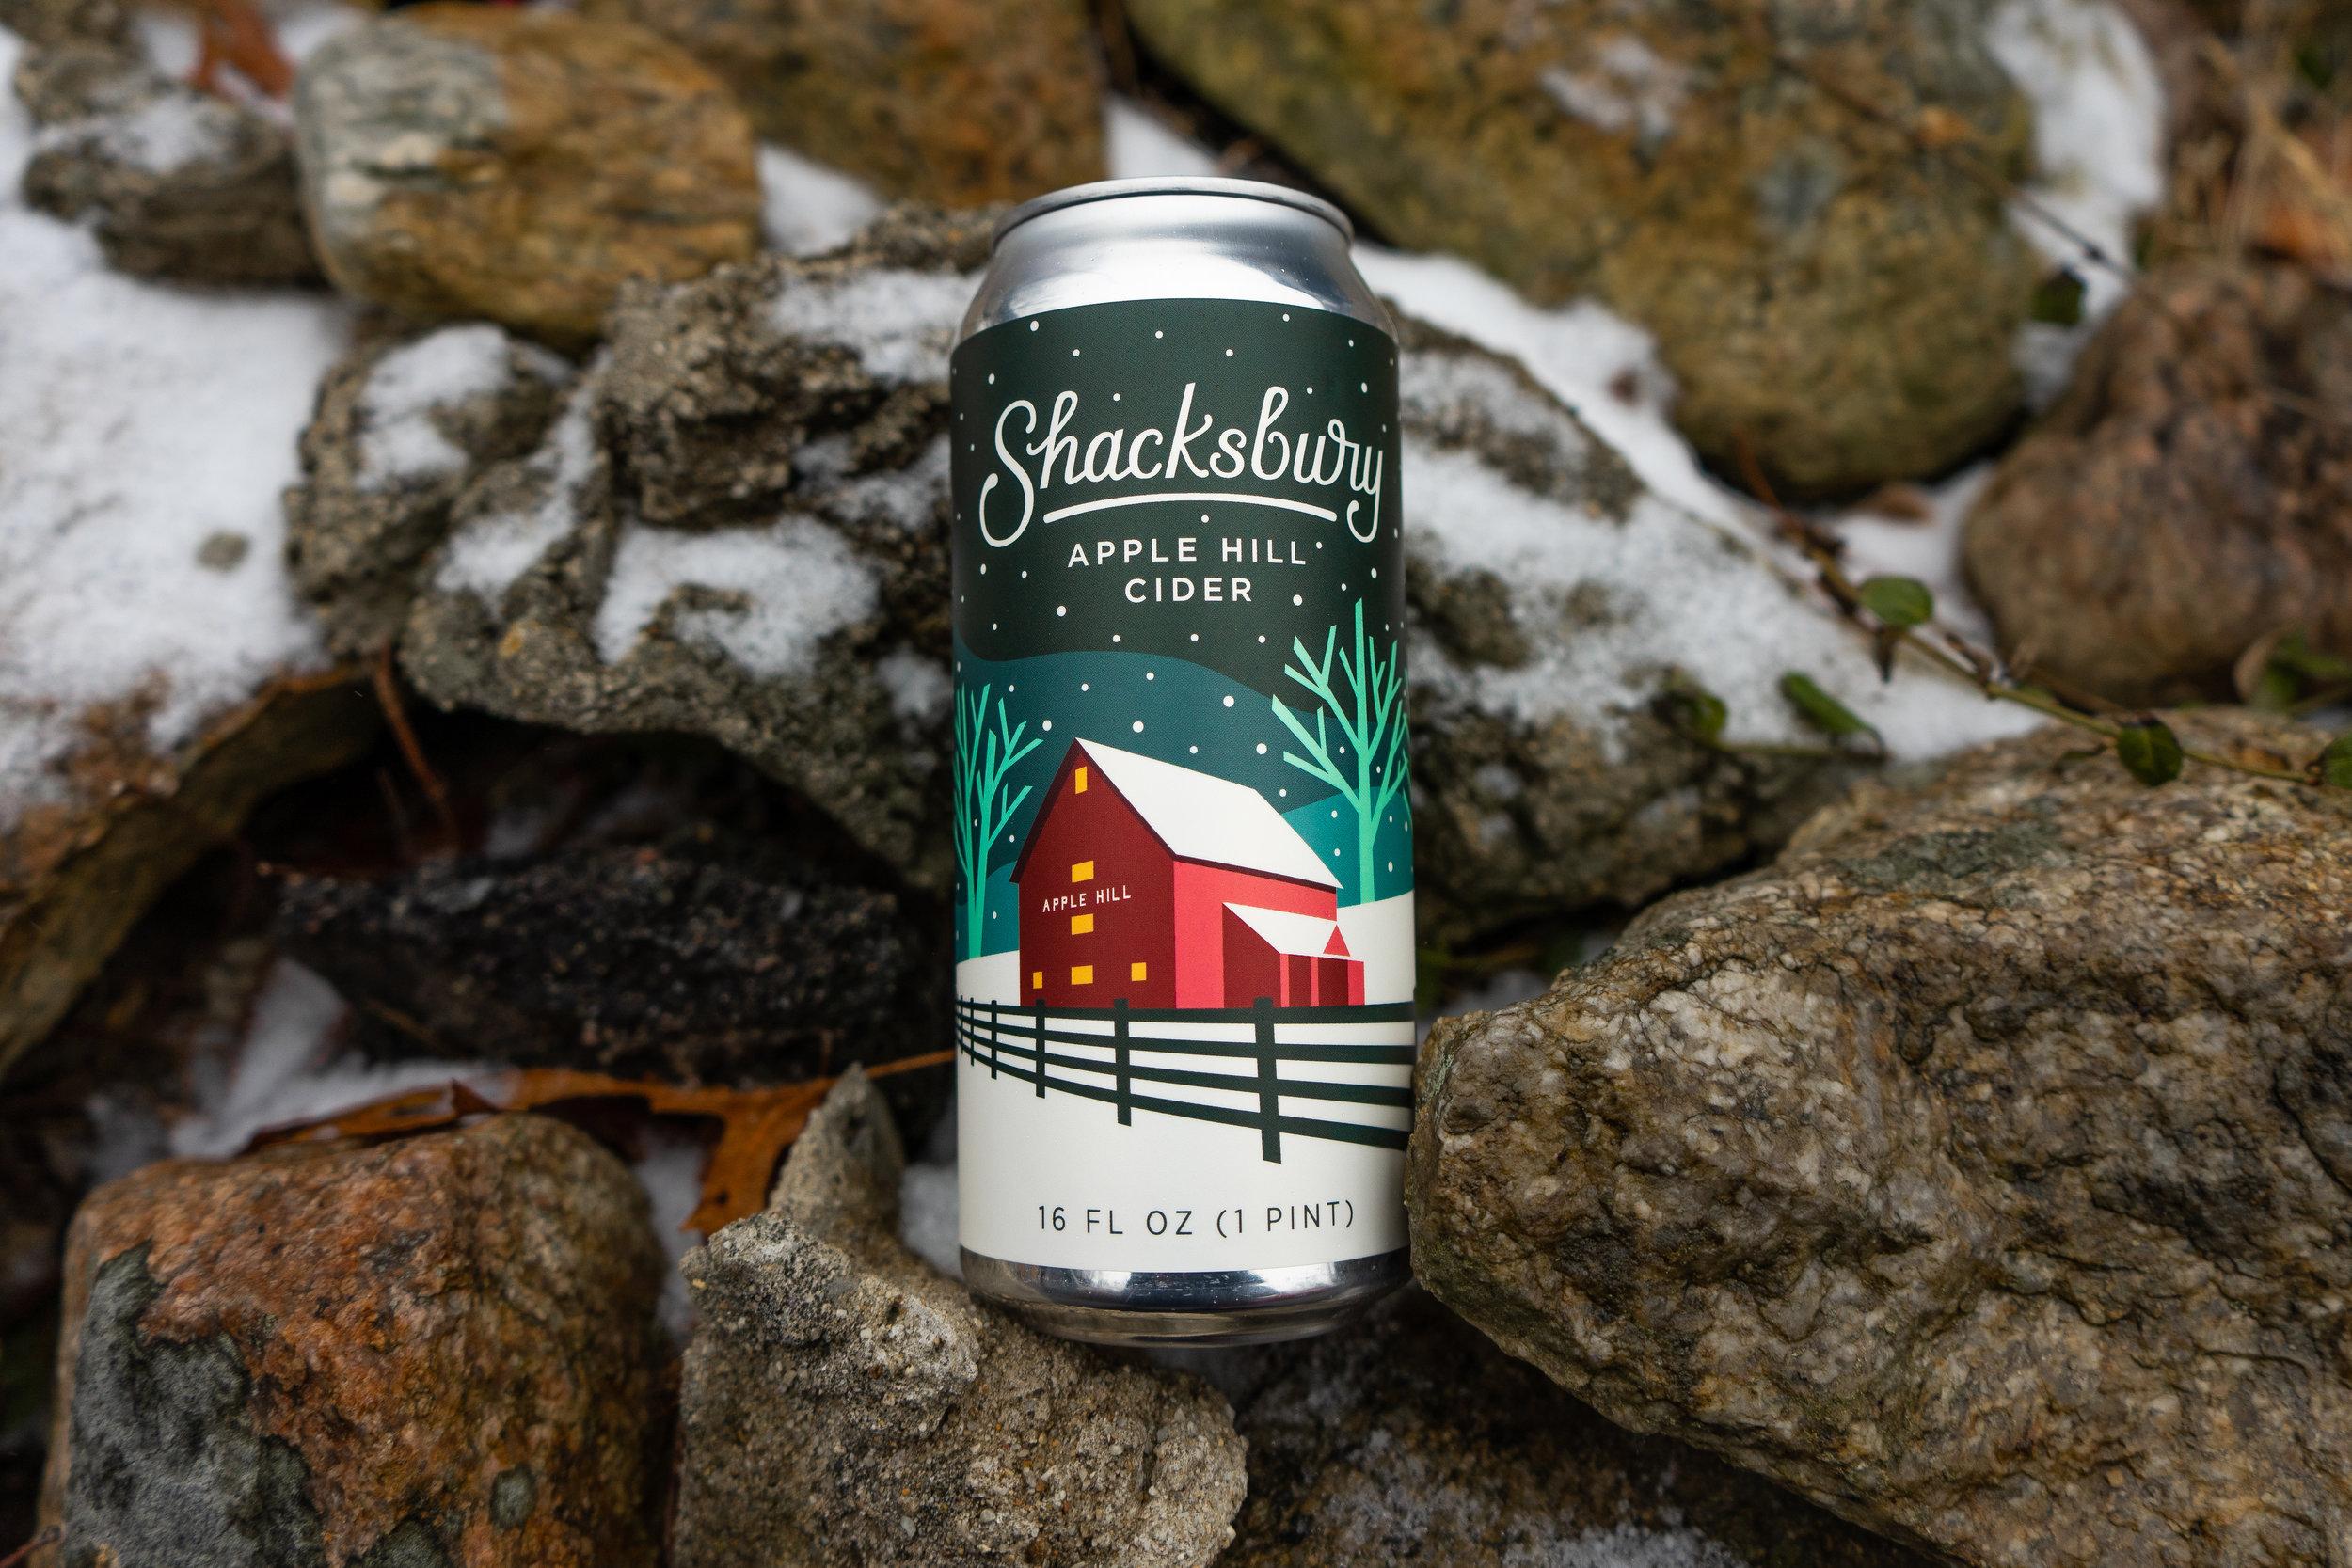 Apple Hill Cider